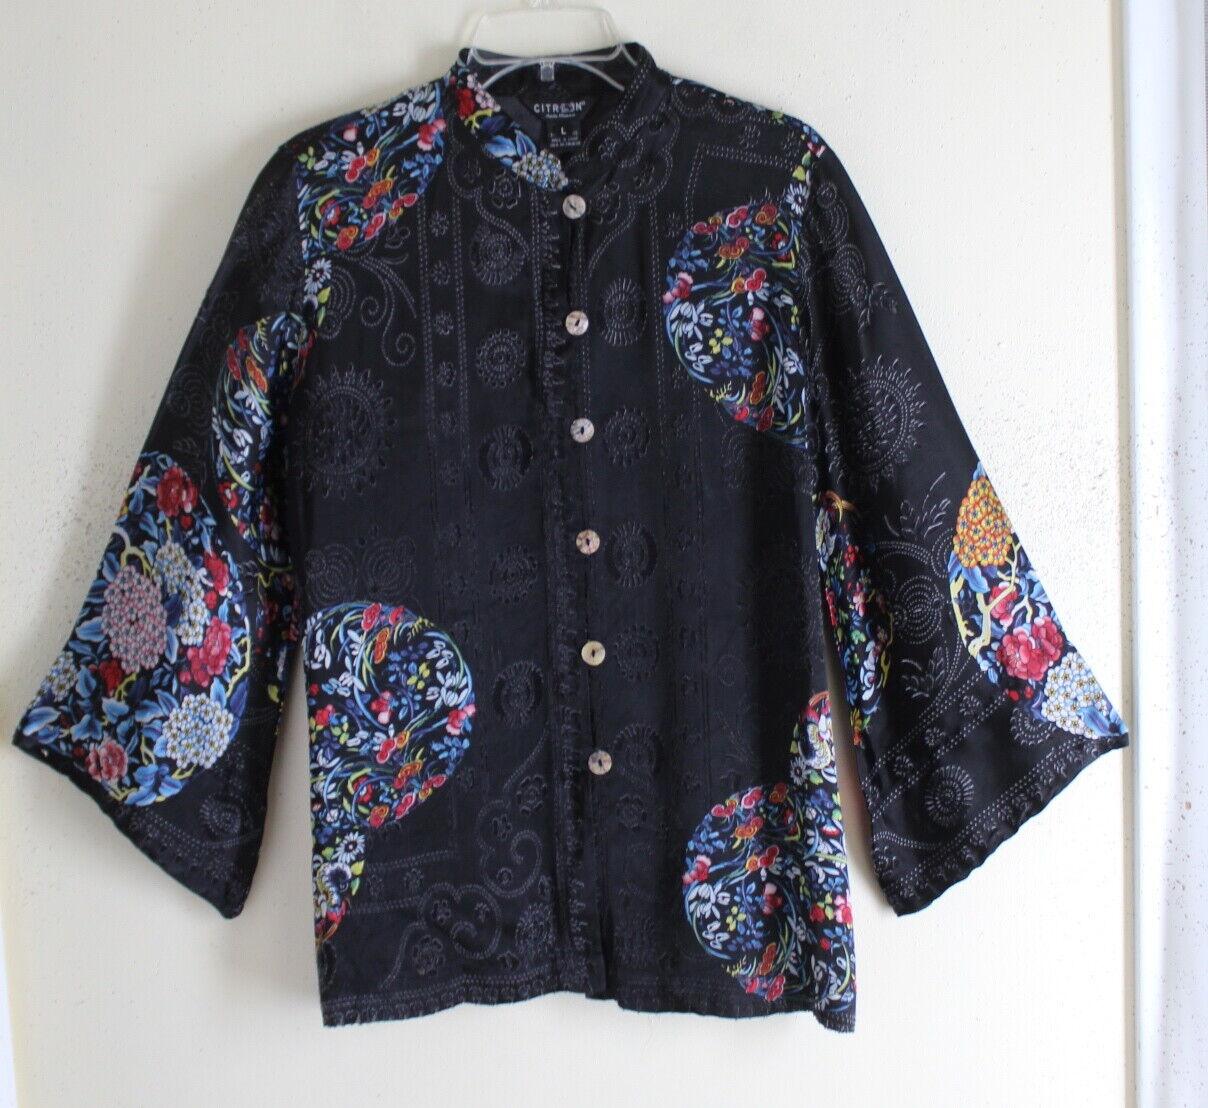 Citron Santa  Monica-Talla L Imperial roundels Asian Devoré Top Camisa azulsa Floral  El nuevo outlet de marcas online.